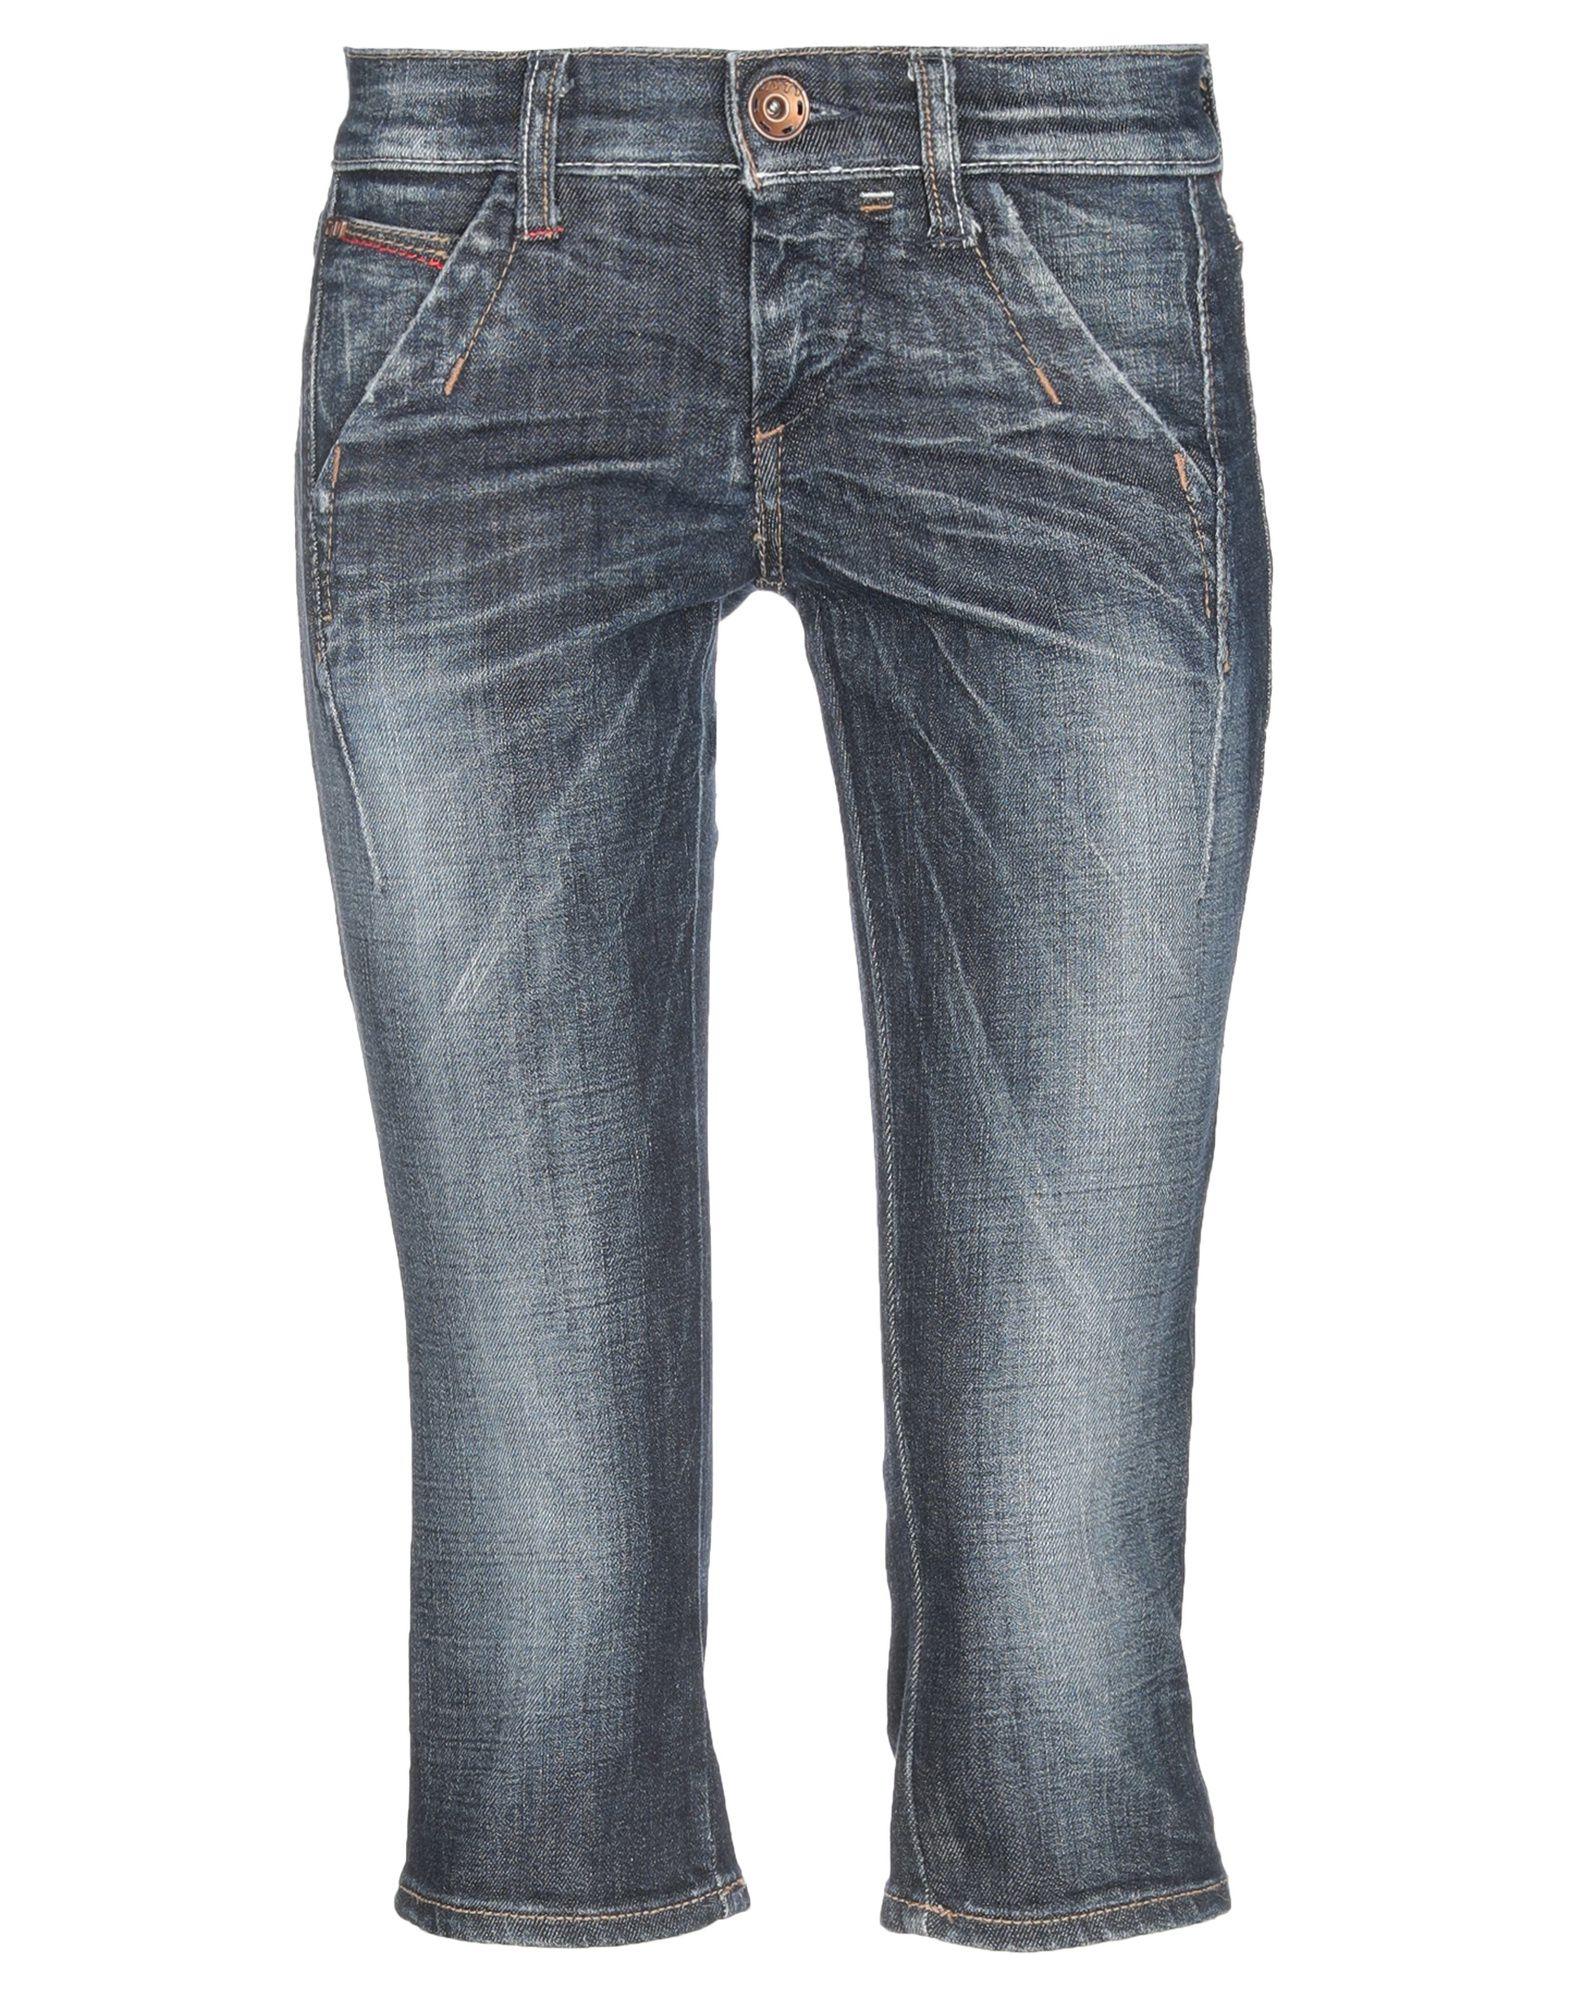 MISS SIXTY Джинсовые брюки-капри цены онлайн